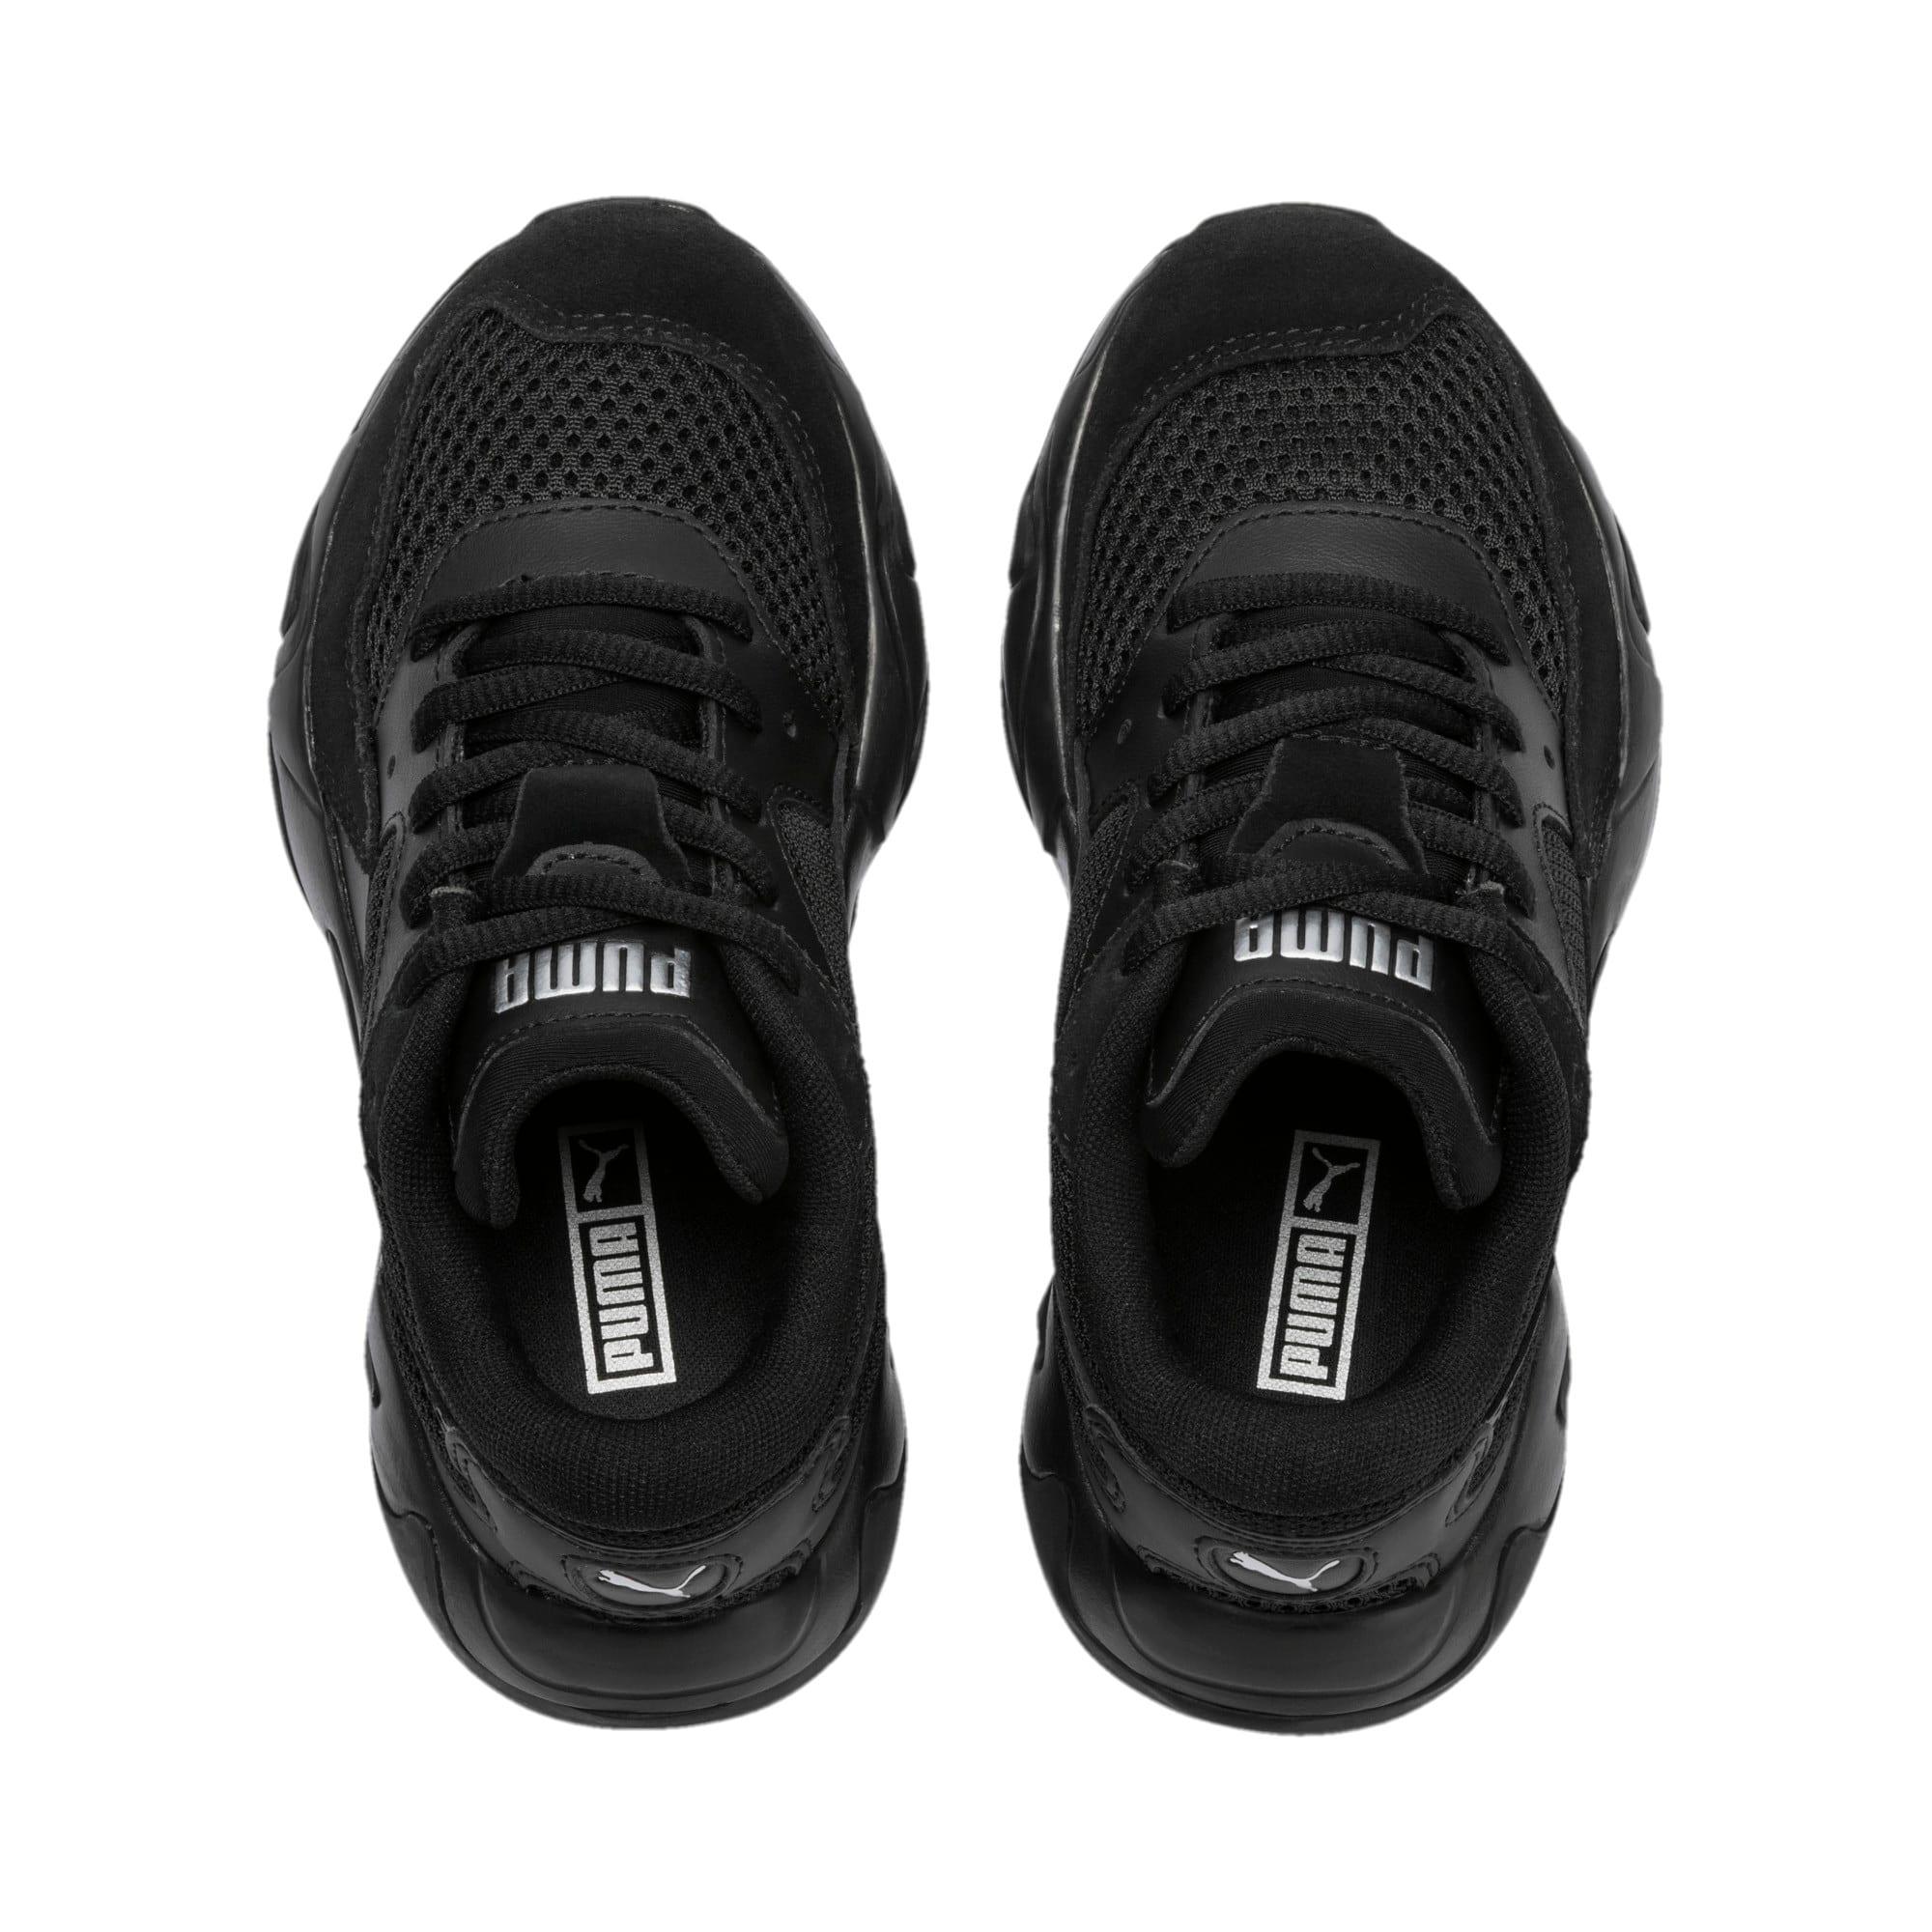 Thumbnail 6 of Storm Origin Little Kids' Shoes, Puma Black, medium